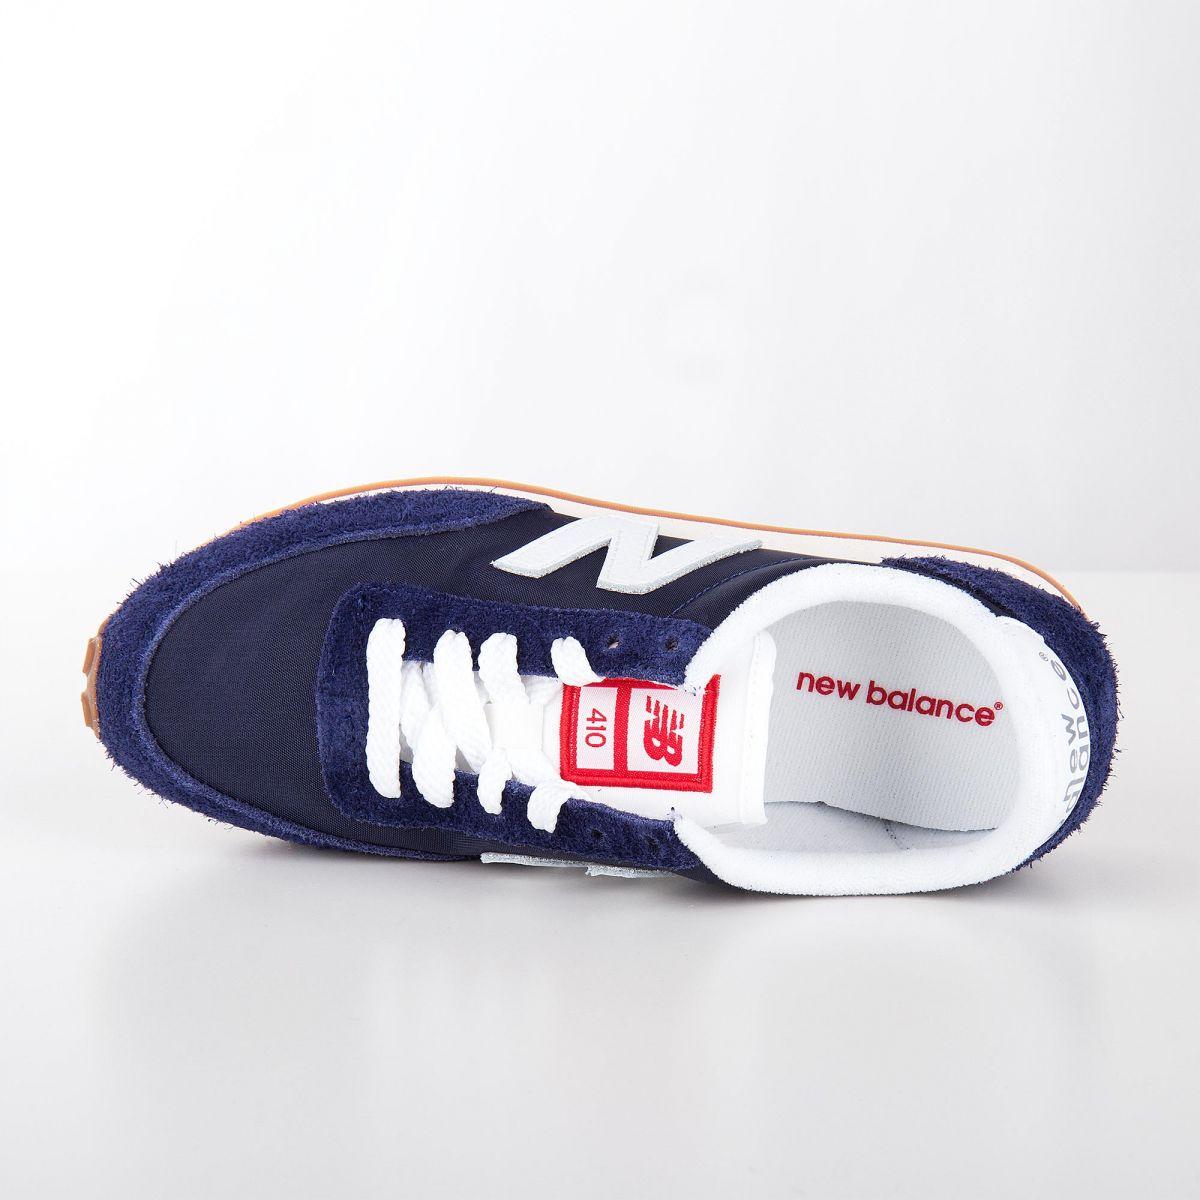 super popular 44b2b a4d47 ... Baskets sneakers U410NY bleu marine enfant NEW BALANCE marque pas cher  prix dégriffés destockage